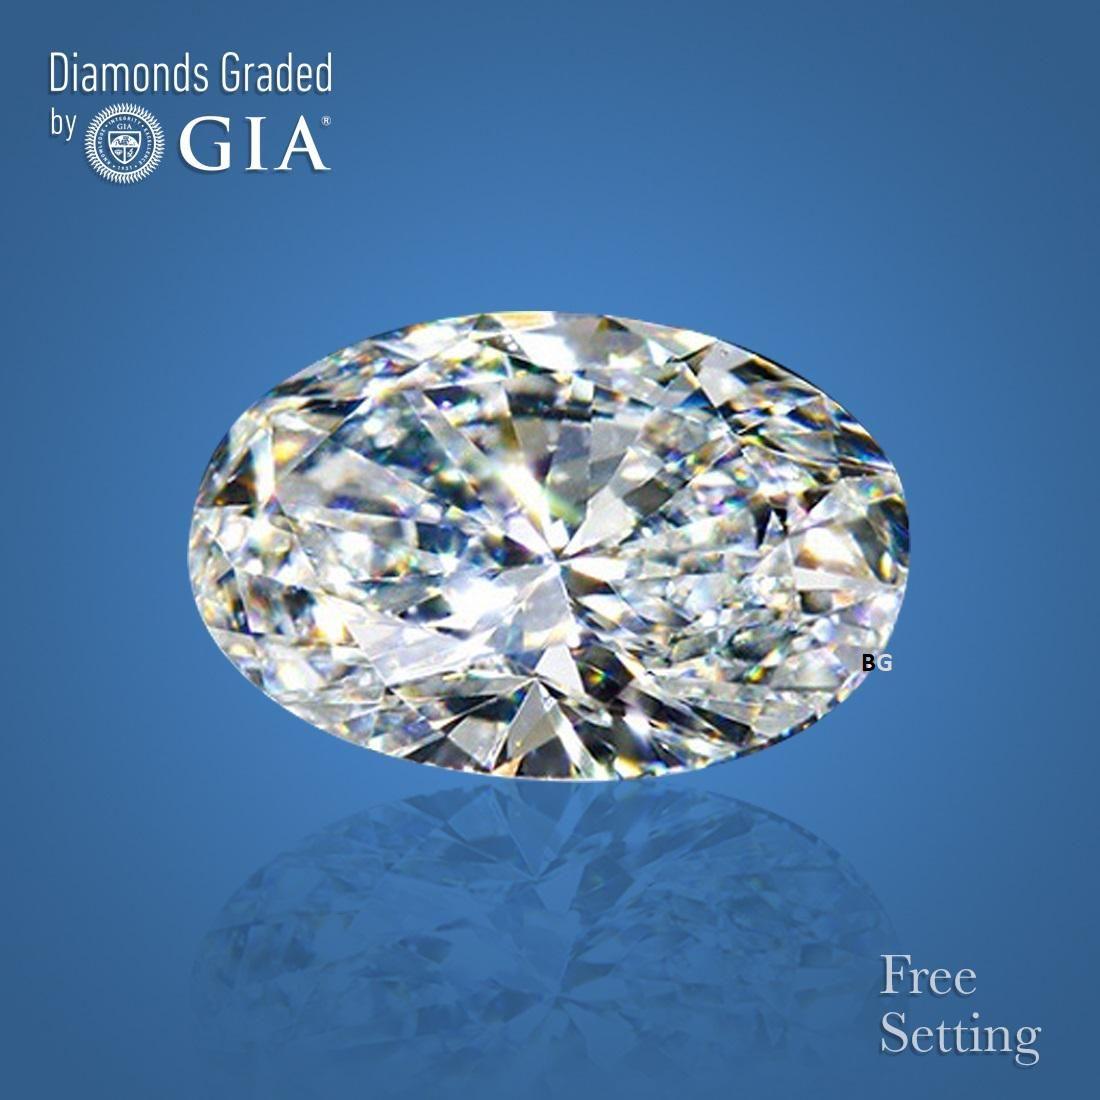 3.01 ct, Color F/VS1, Oval cut GIA Graded Diamond